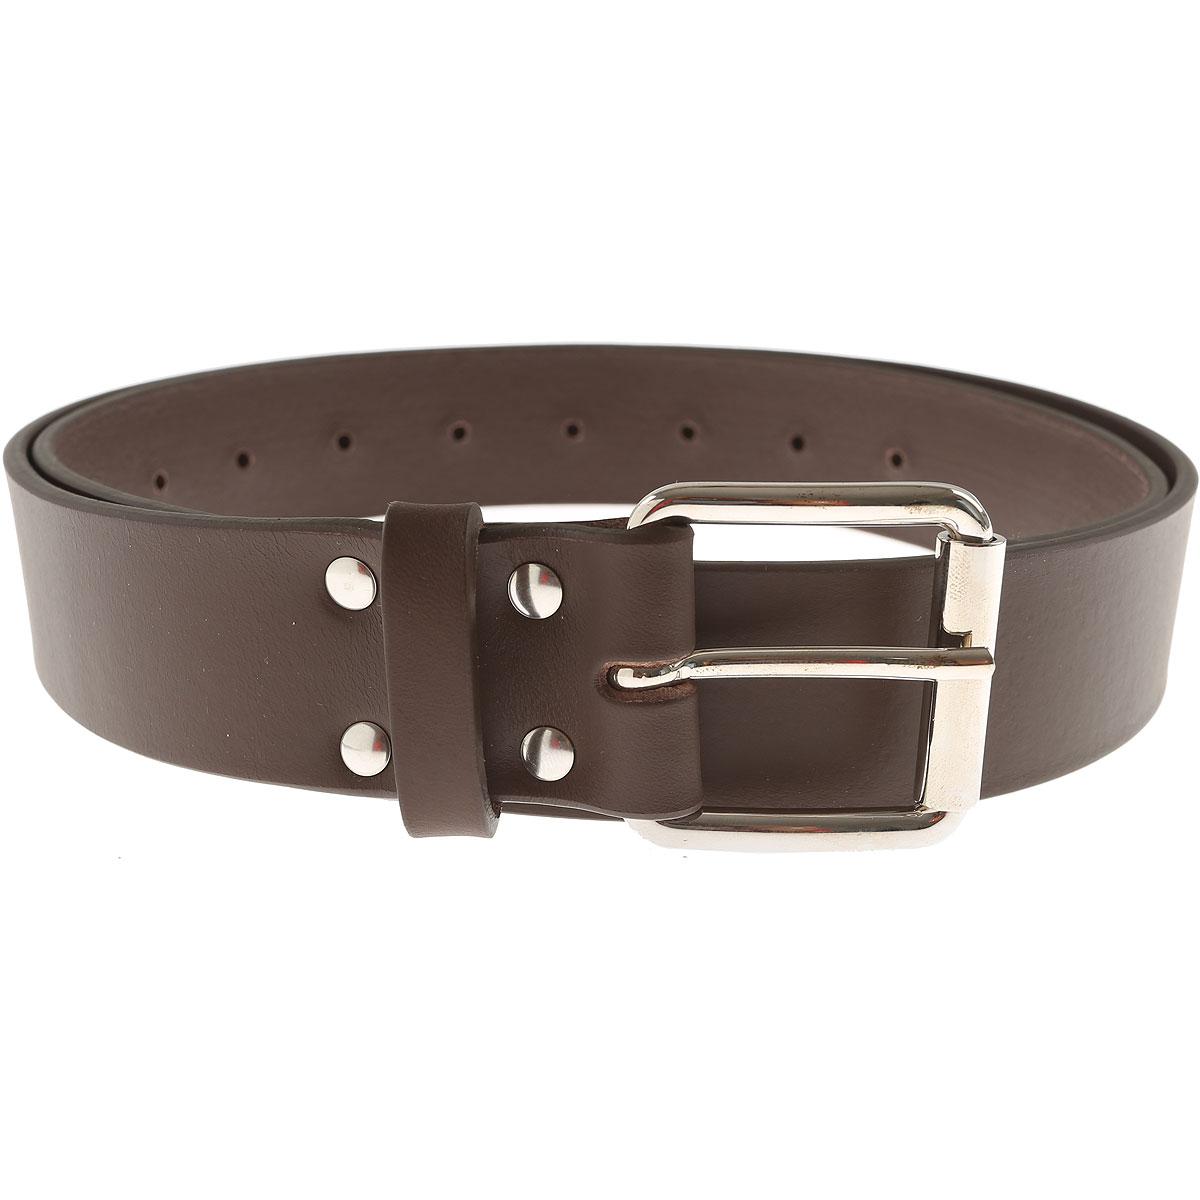 Image of Comme des Garcons Mens Belts, Brown, Leather, 2017